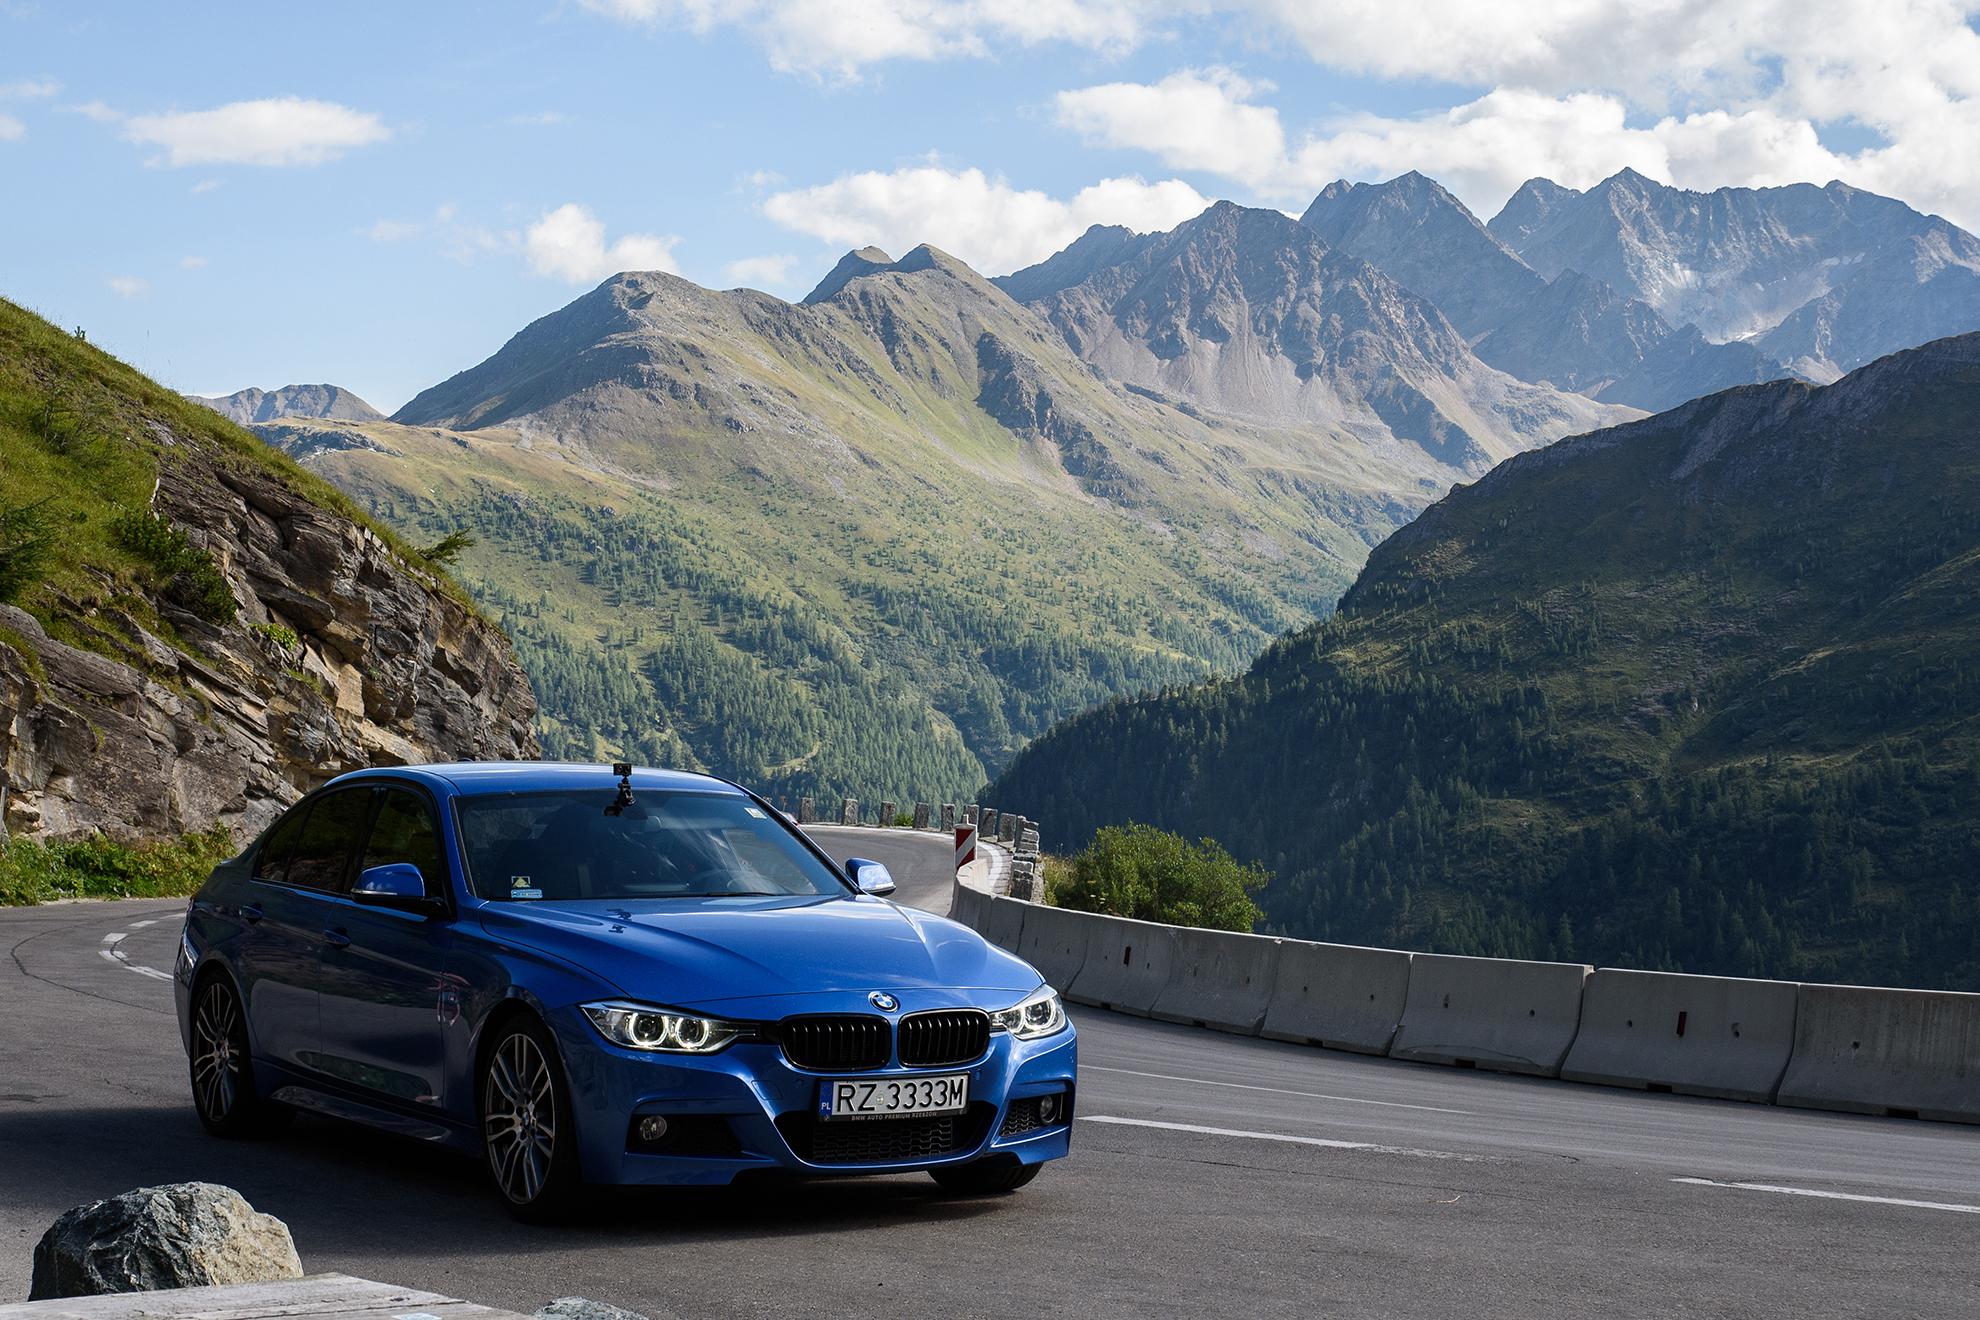 BMW serii 3 (F30) na Grosslockener